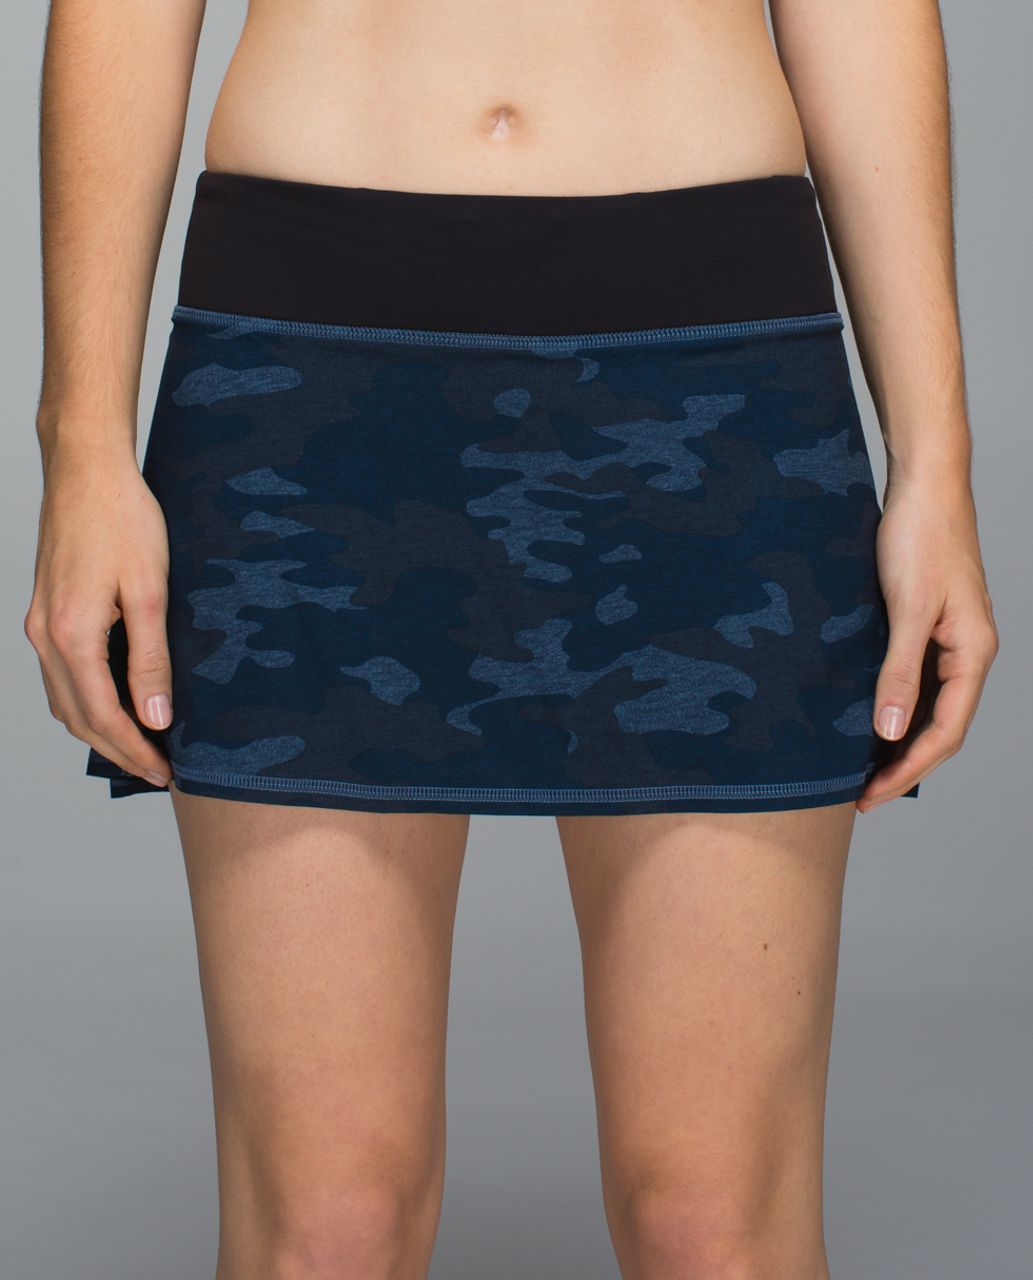 Lululemon Run:  Pace Setter Skirt *4-way Stretch (Regular) - Heathered Texture Lotus Camo Oil Slick Blue / Black